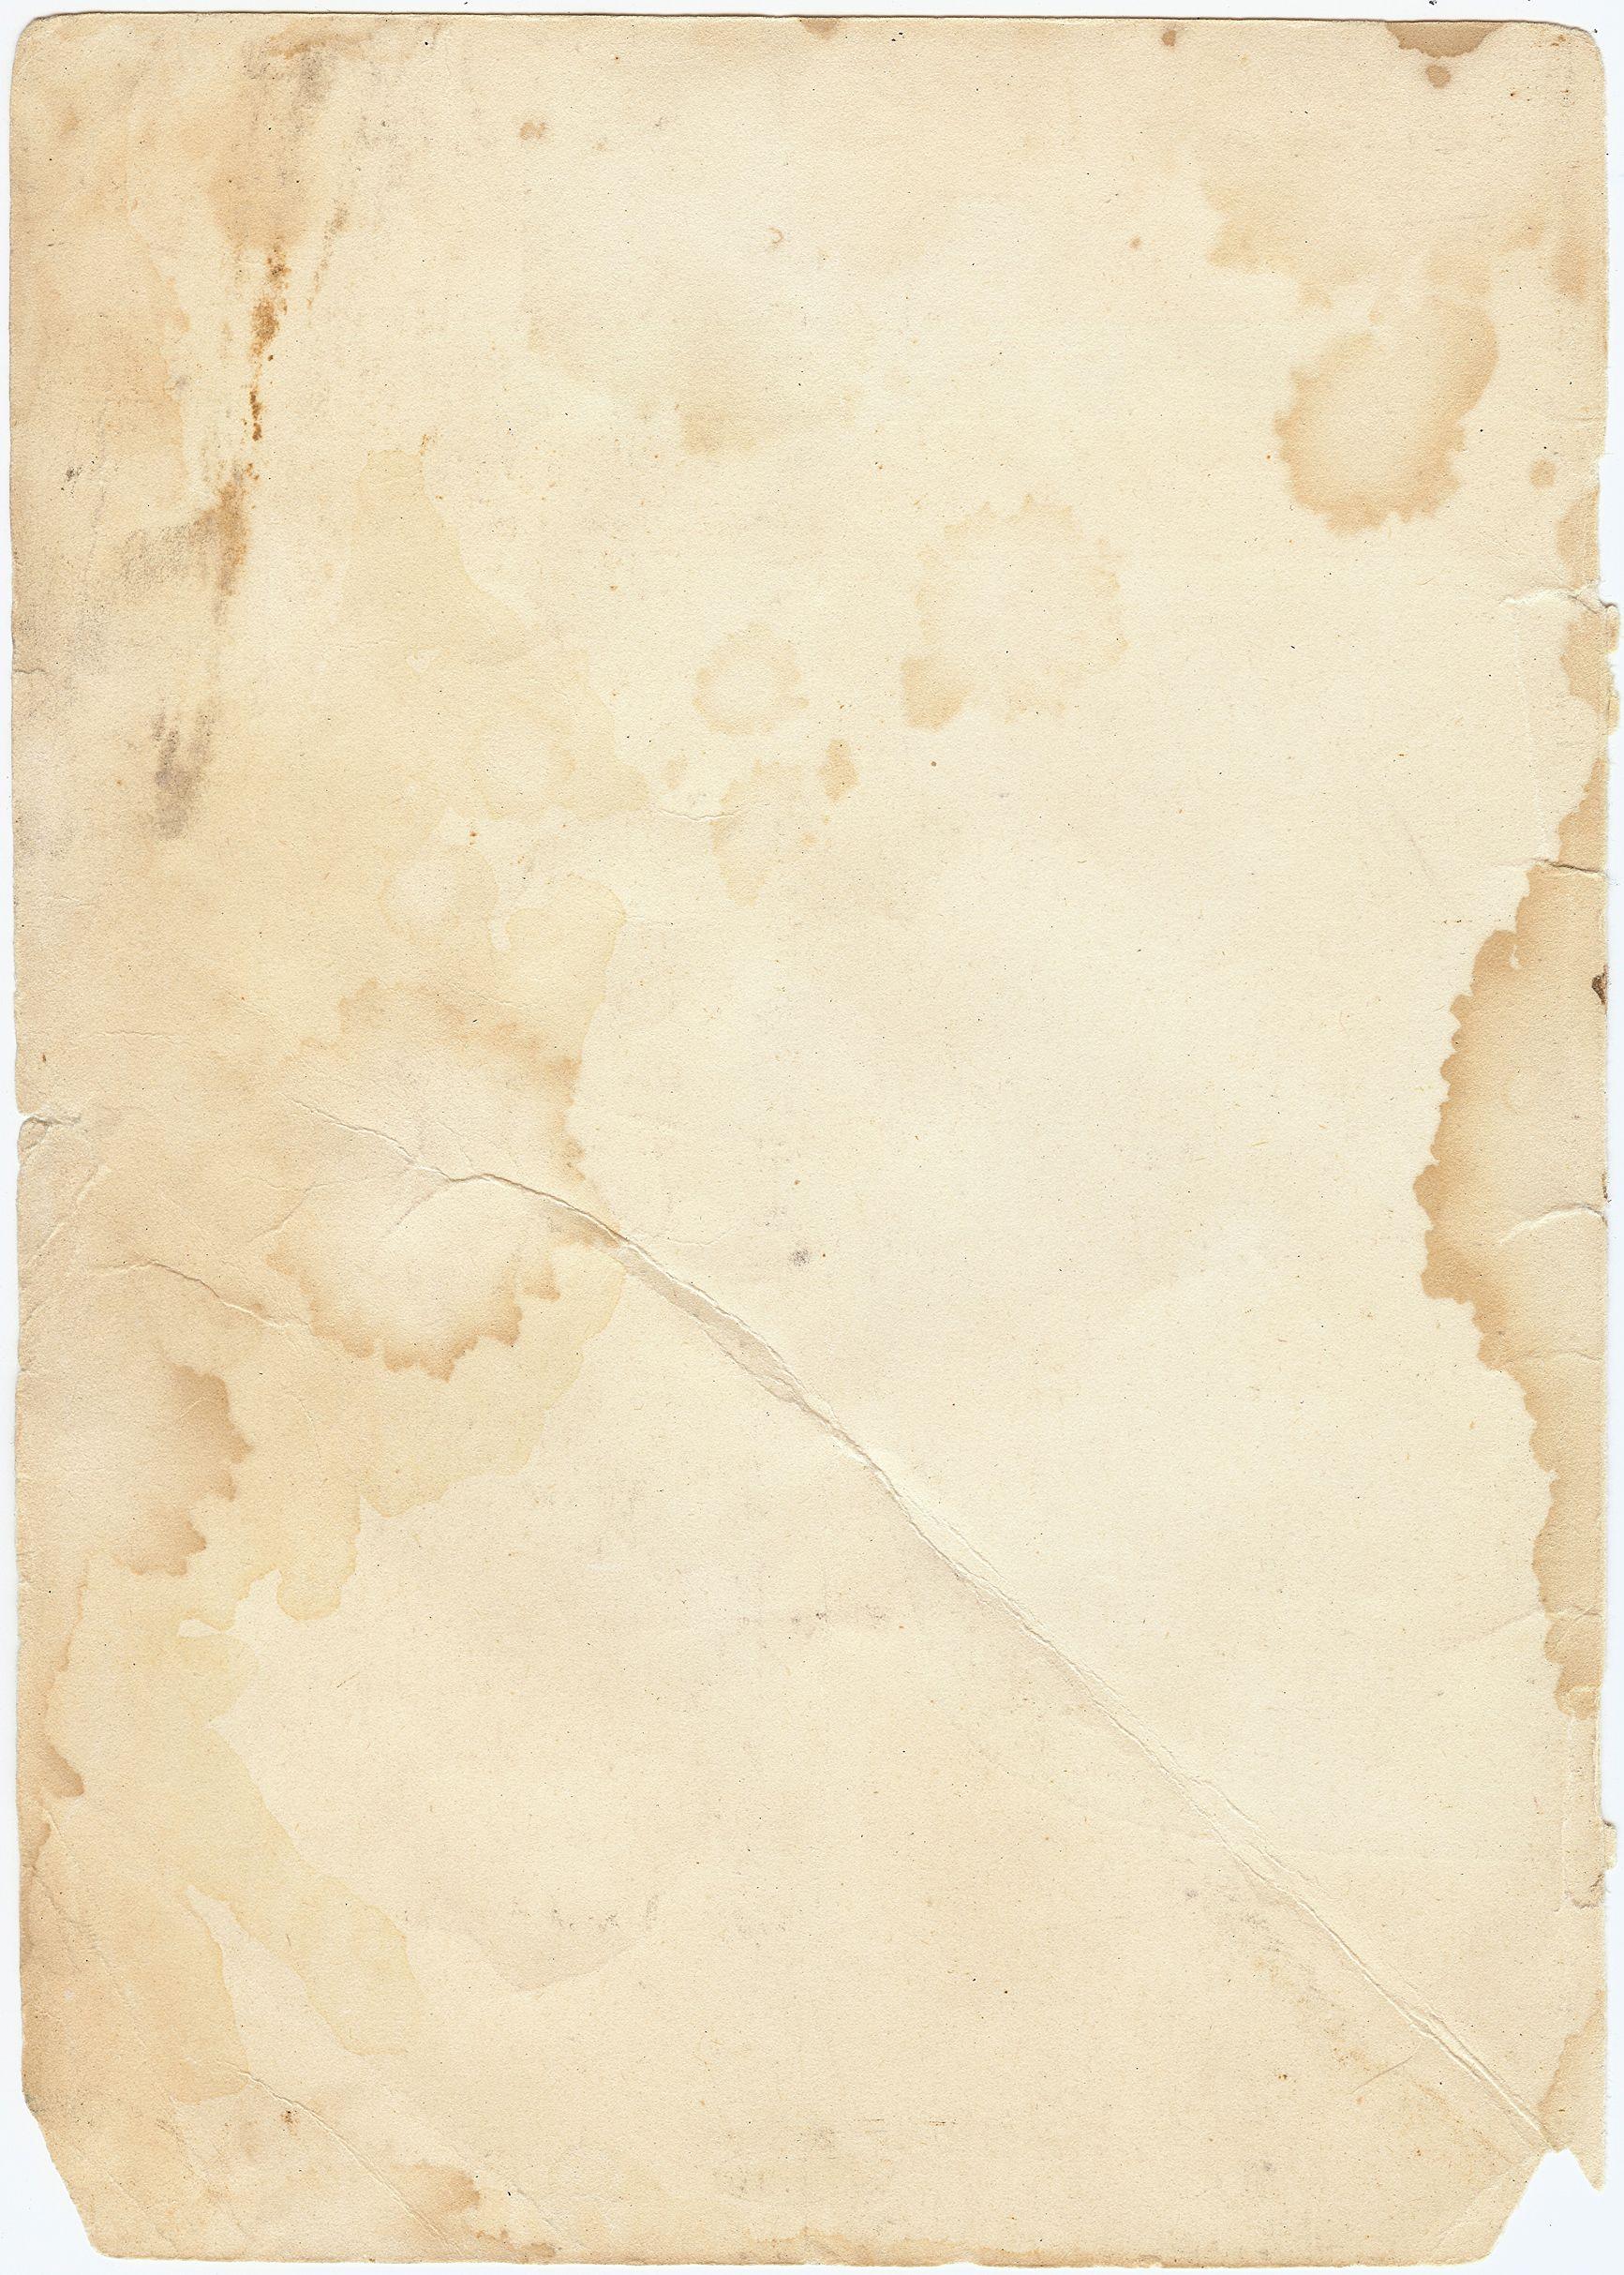 Old Paper Texture By Pandoraicons On Deviantart Vintage Paper